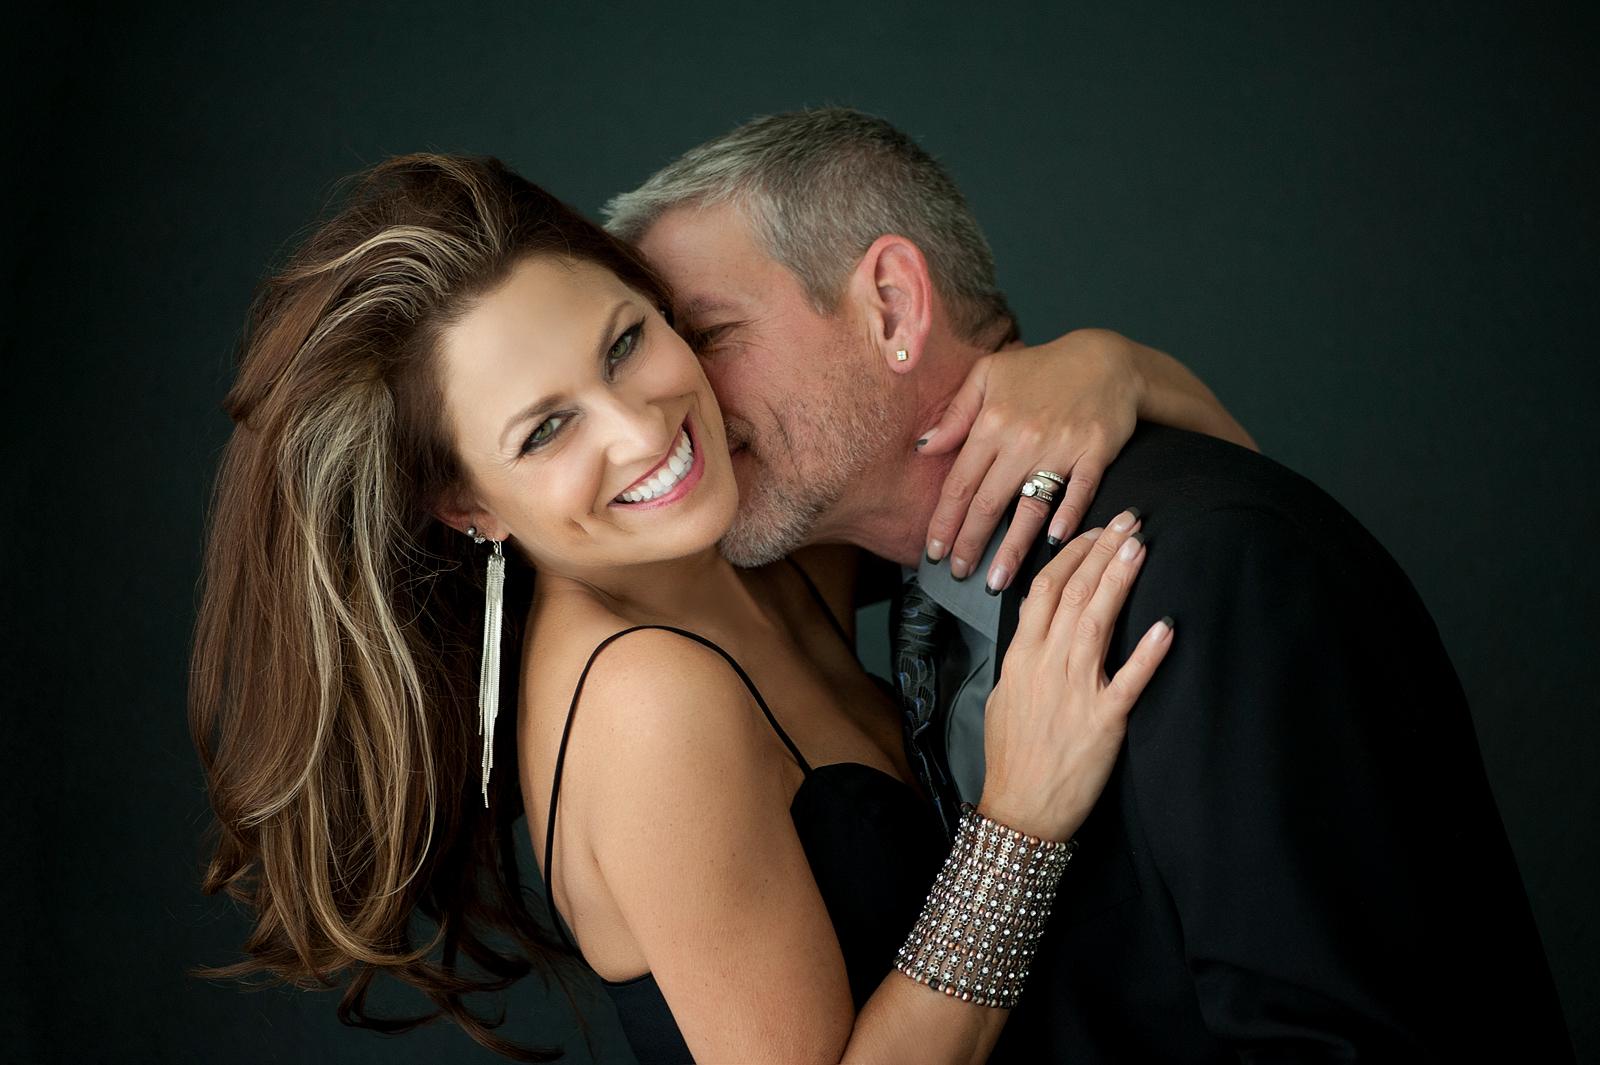 09-kiss-neck-dashing-romantic-lovers.jpg